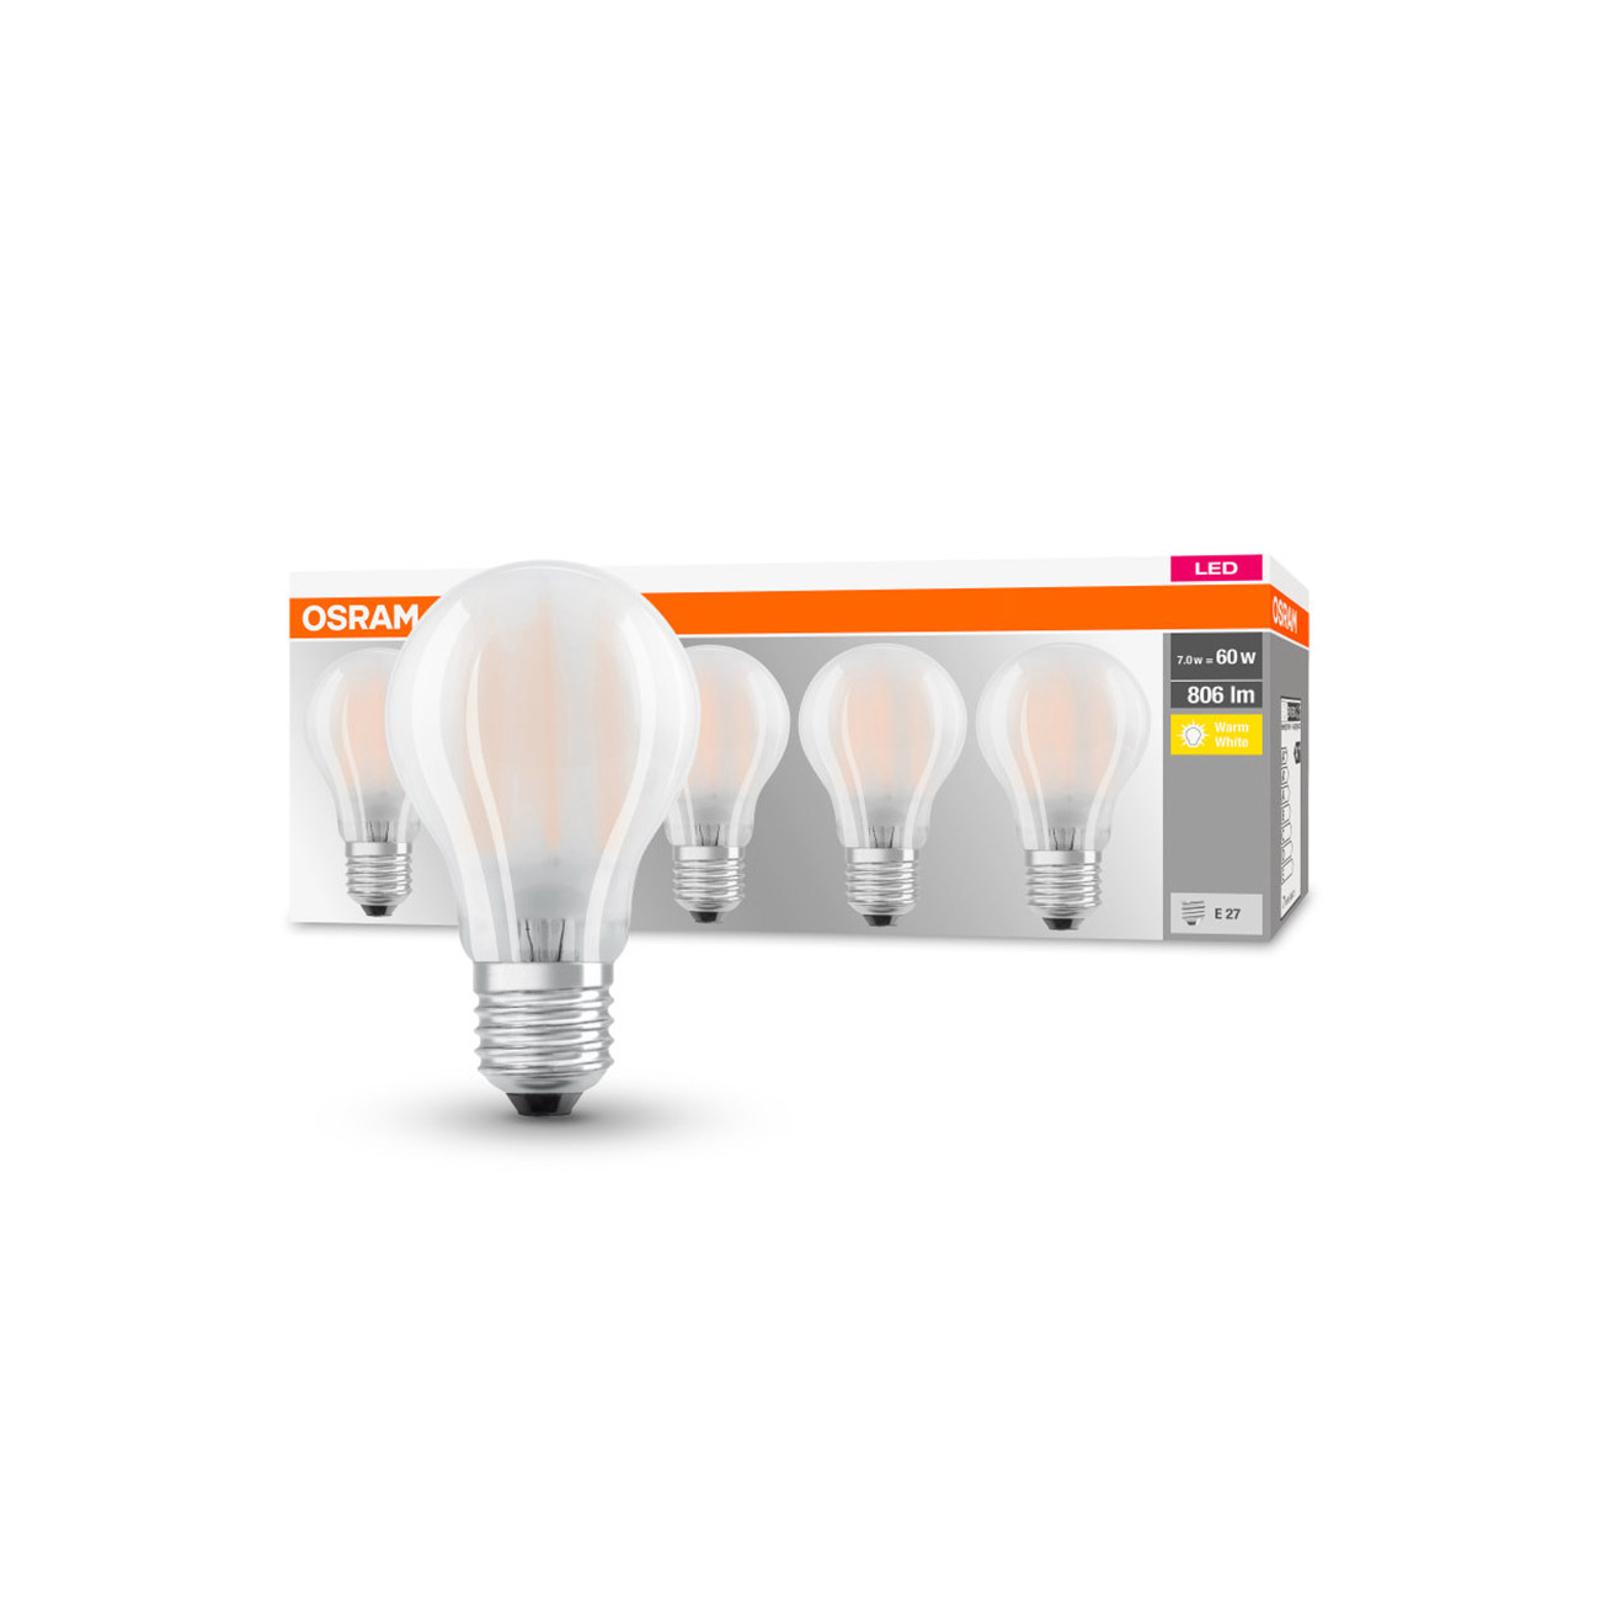 OSRAM LED-Lampe Classic E27 7W 2.700K 806lm 5er